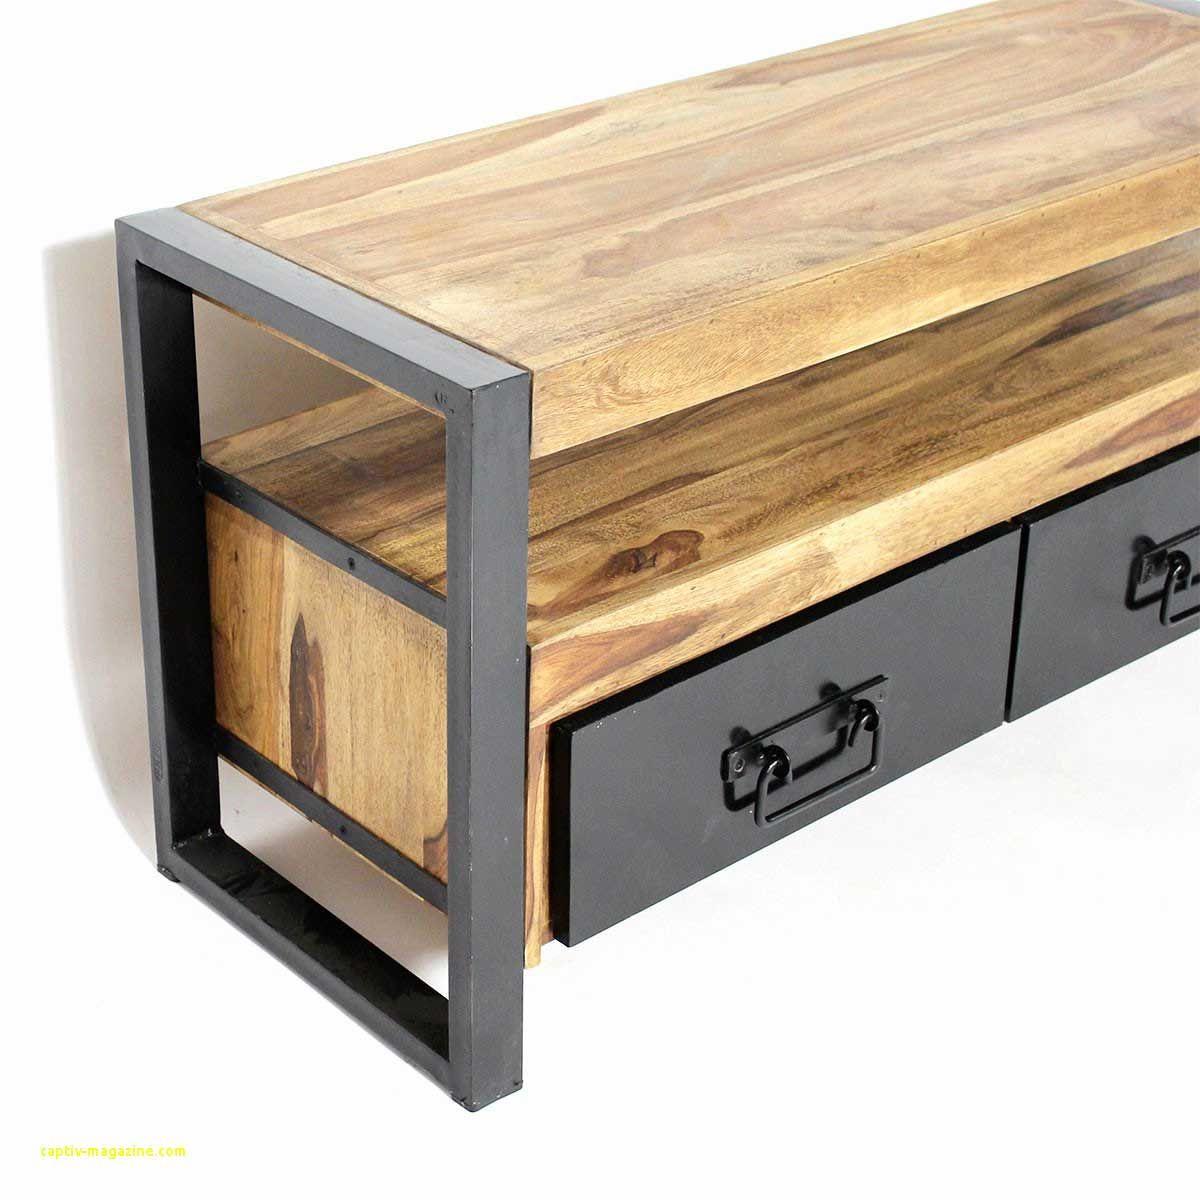 Meuble Tv Et Table Basse Table Basse Tv Meuble Tv Table Basse Impressionnant Meuble Tv Mactal Of Meu Welded Furniture Kitchen Design Tv Unit Furniture